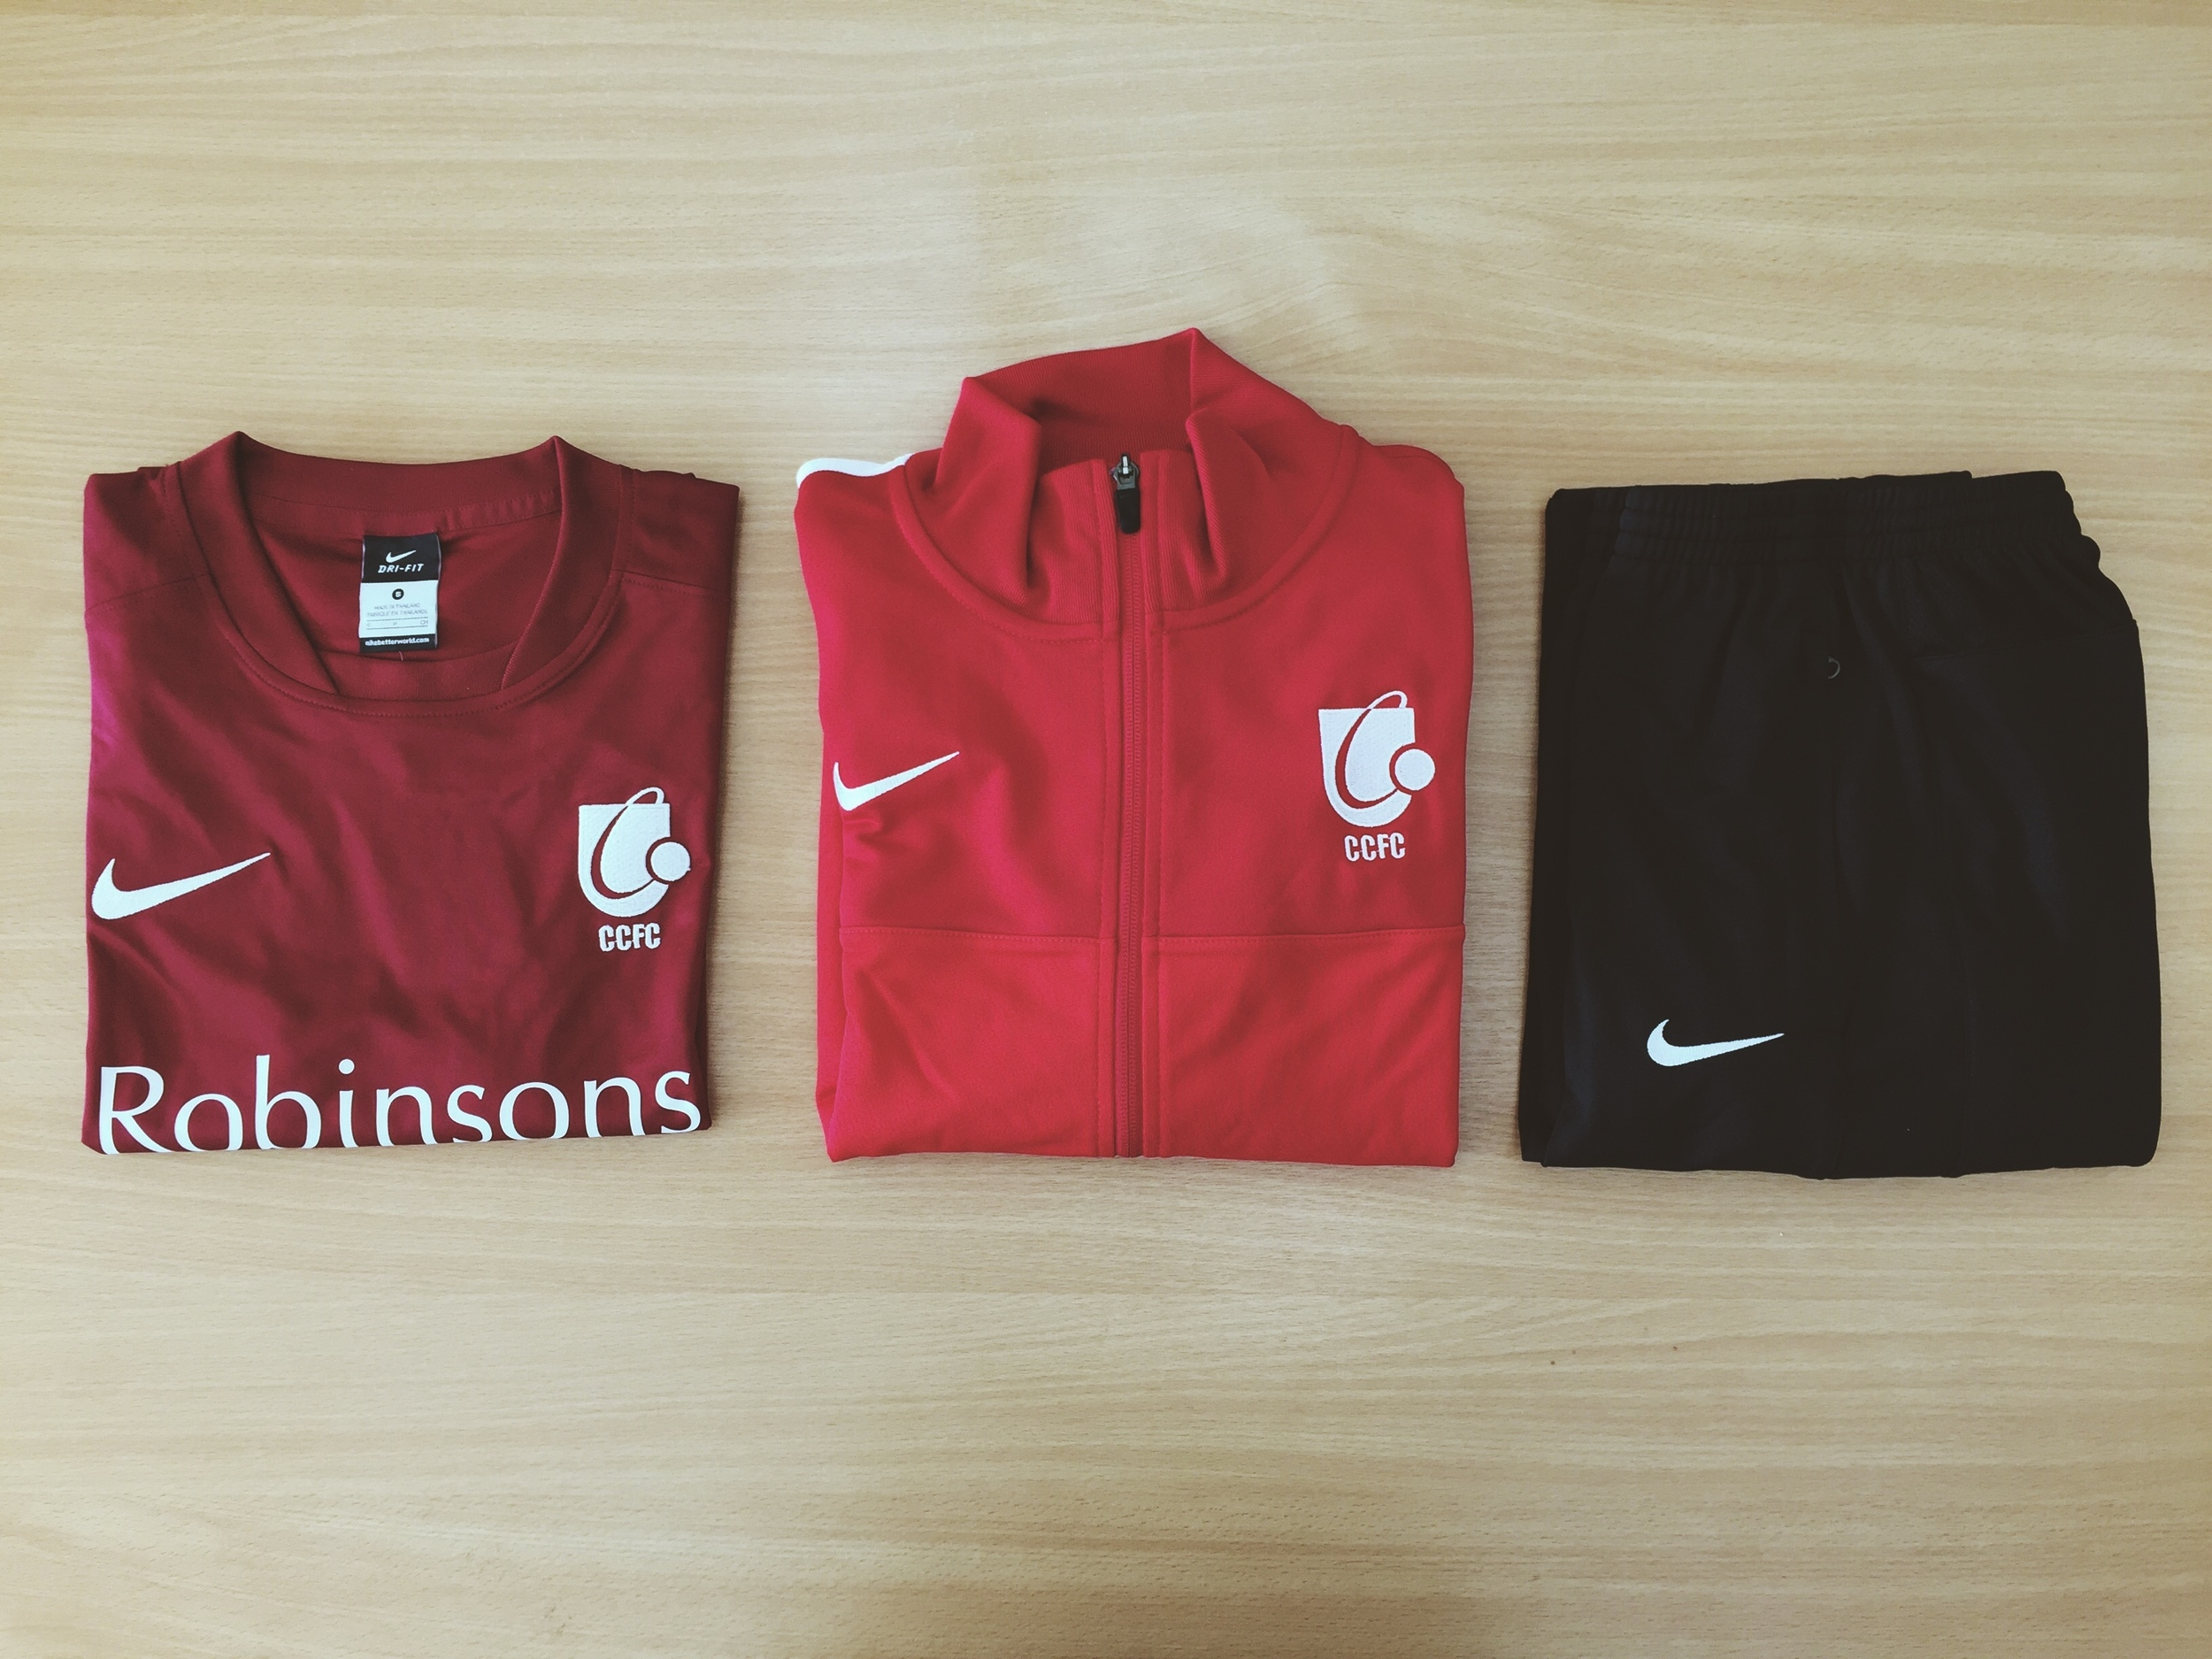 CCFC Nike Team Kit